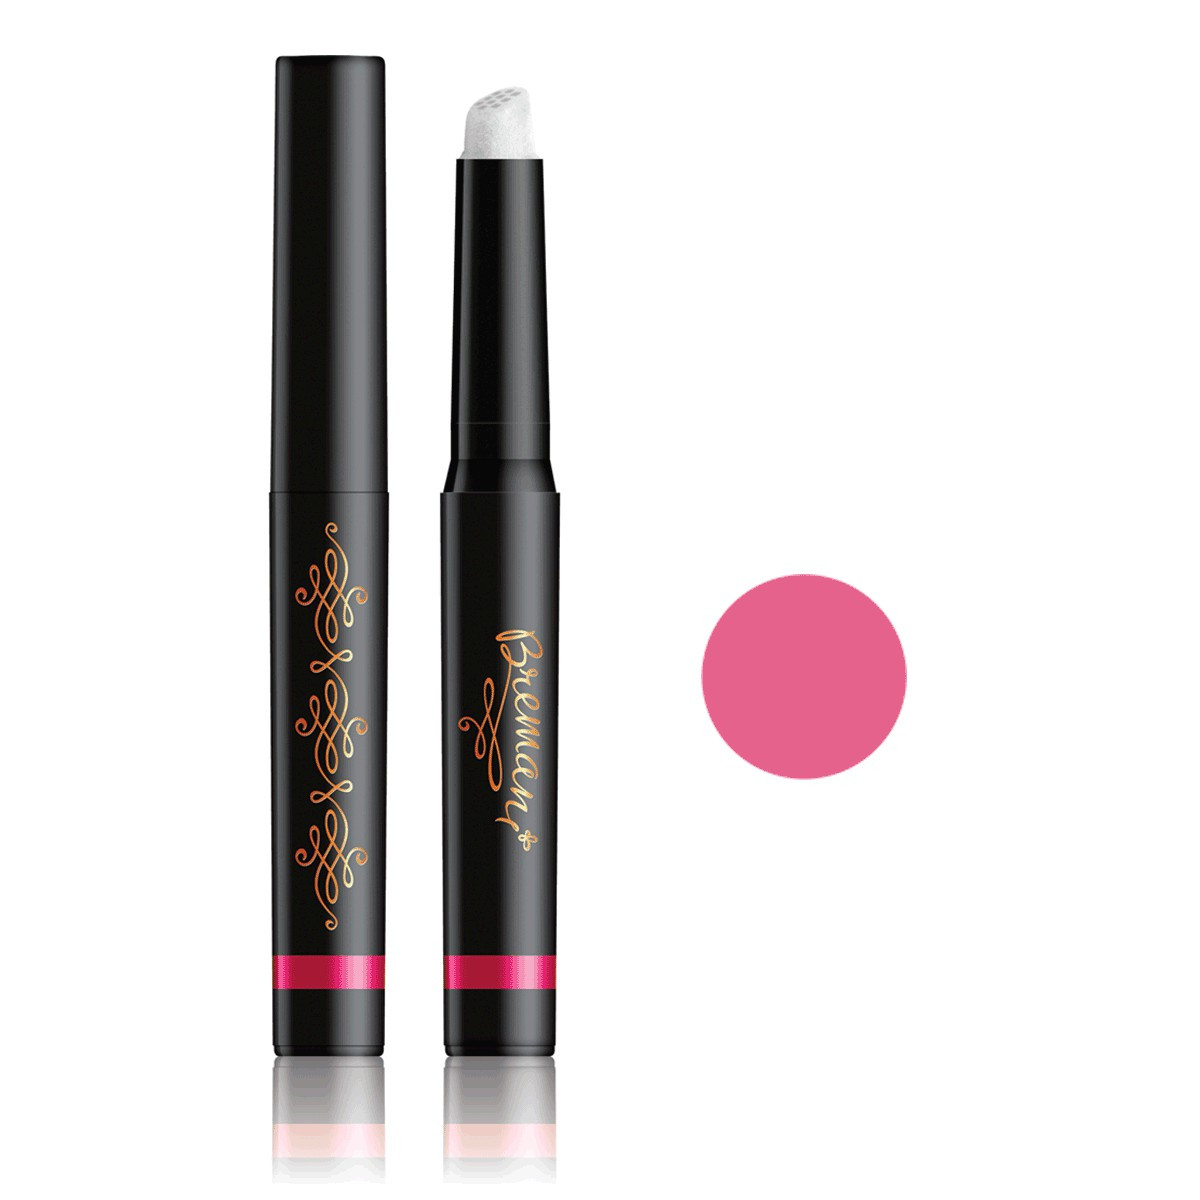 "Lipstick Camellia Помада ""Камелия"" с фибровым аппликатором, Bremani, Бремани, Италия, НСП."